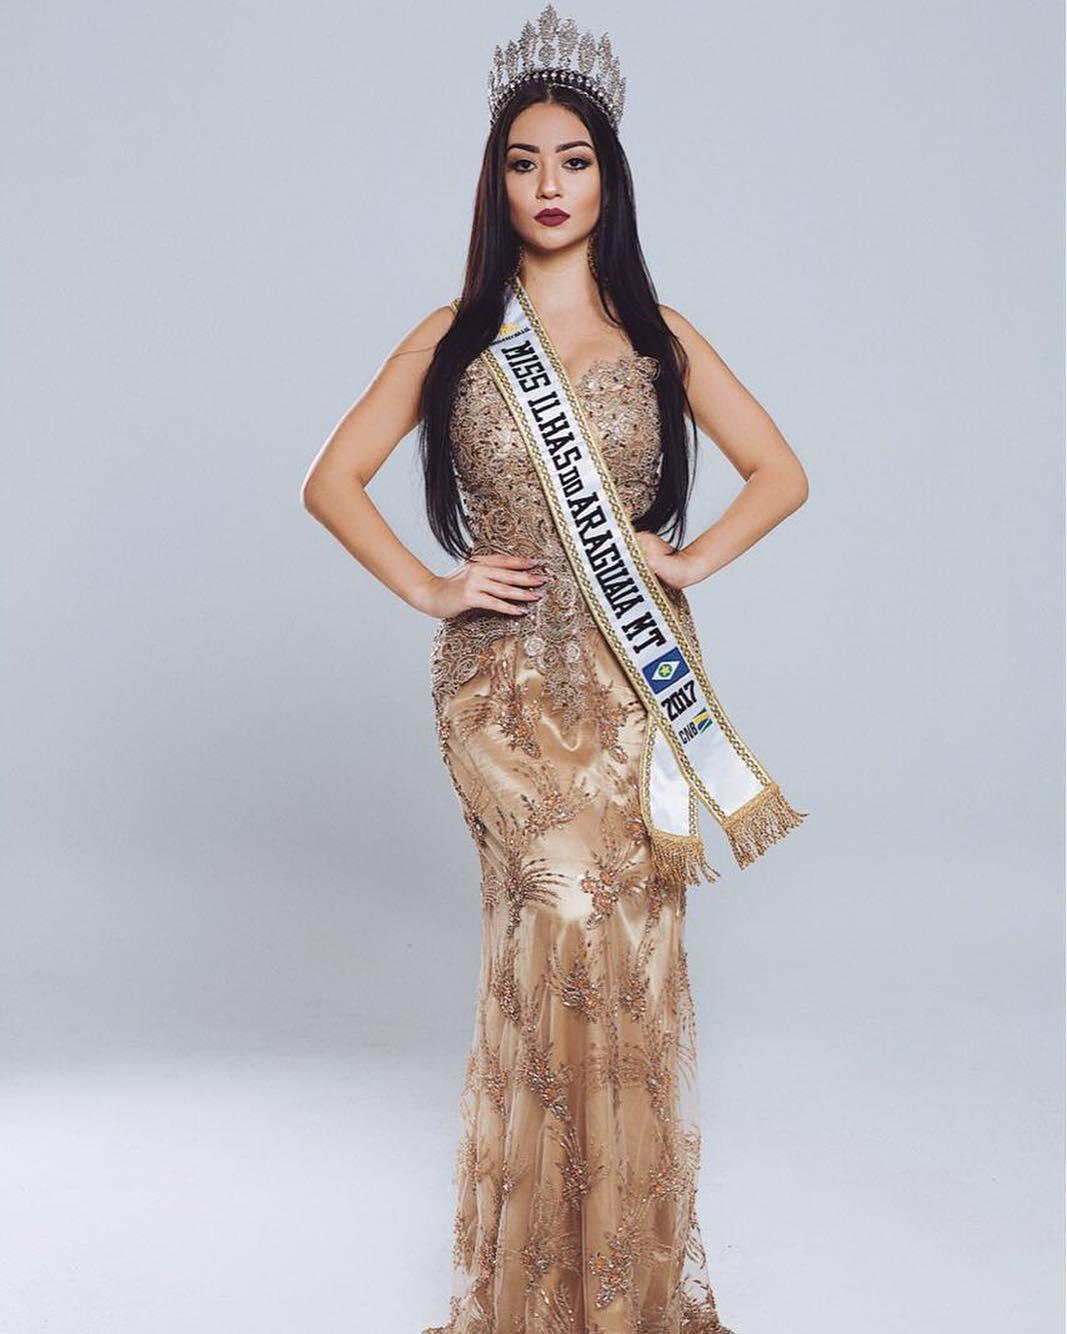 miss araguaia, ilhas (ilhas do araguaia) mundo 2017, quetlin heidrich. 18809610